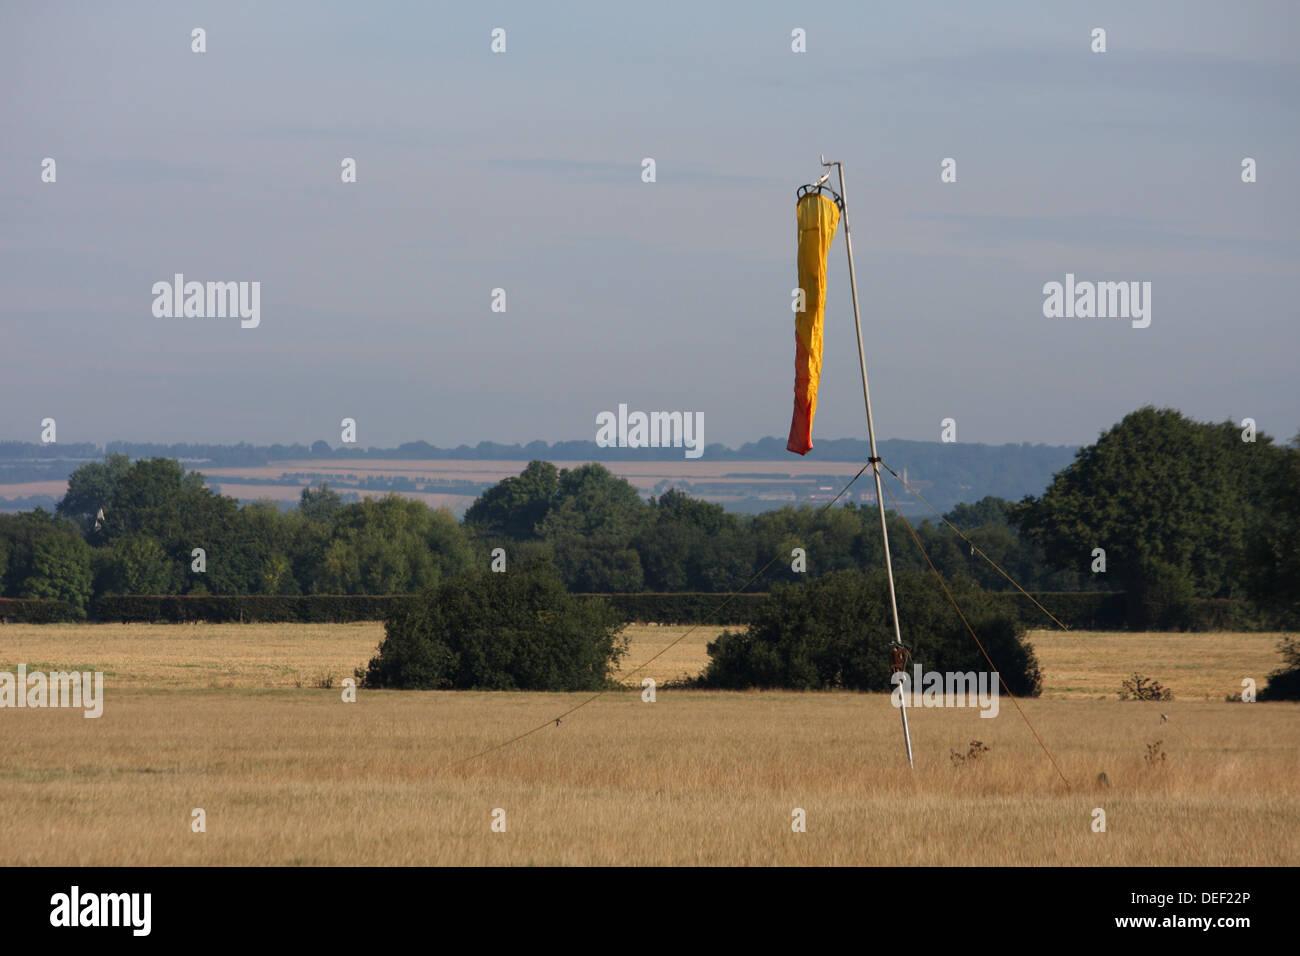 Wind Sock at Headcorn Areodrome, Kent - Stock Image